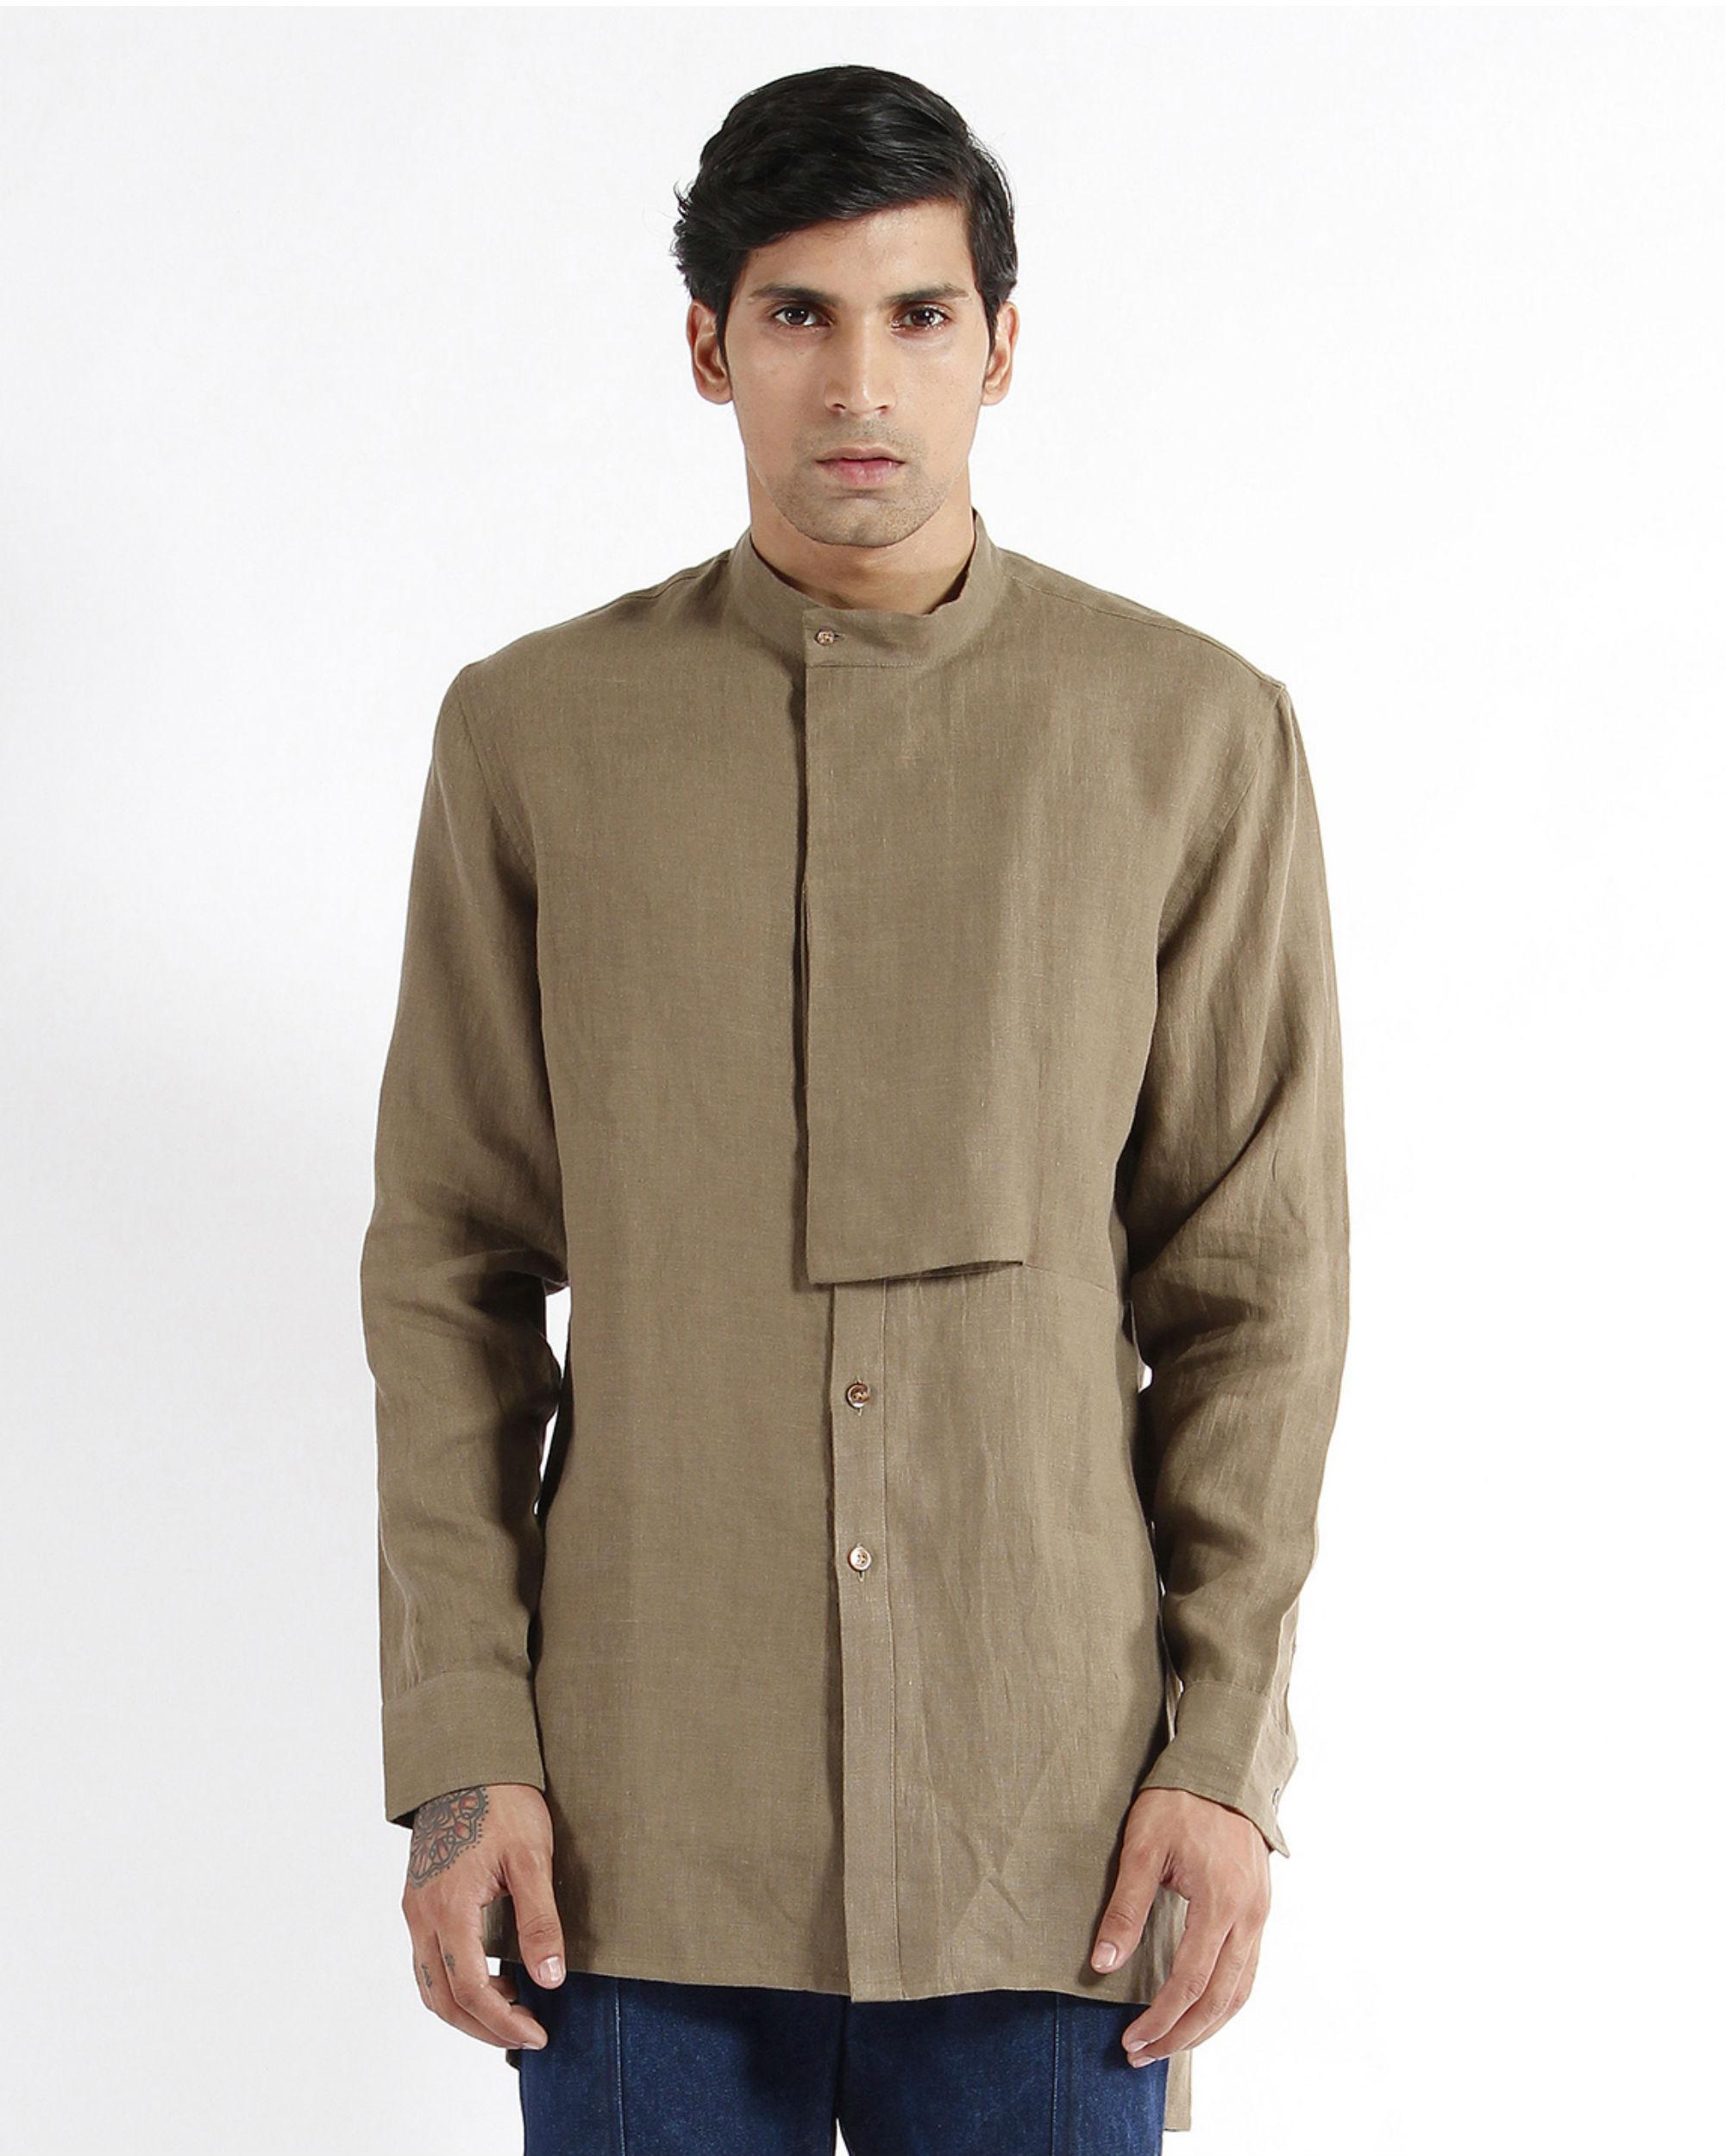 Olive khaki linen embroidered tunic shirt